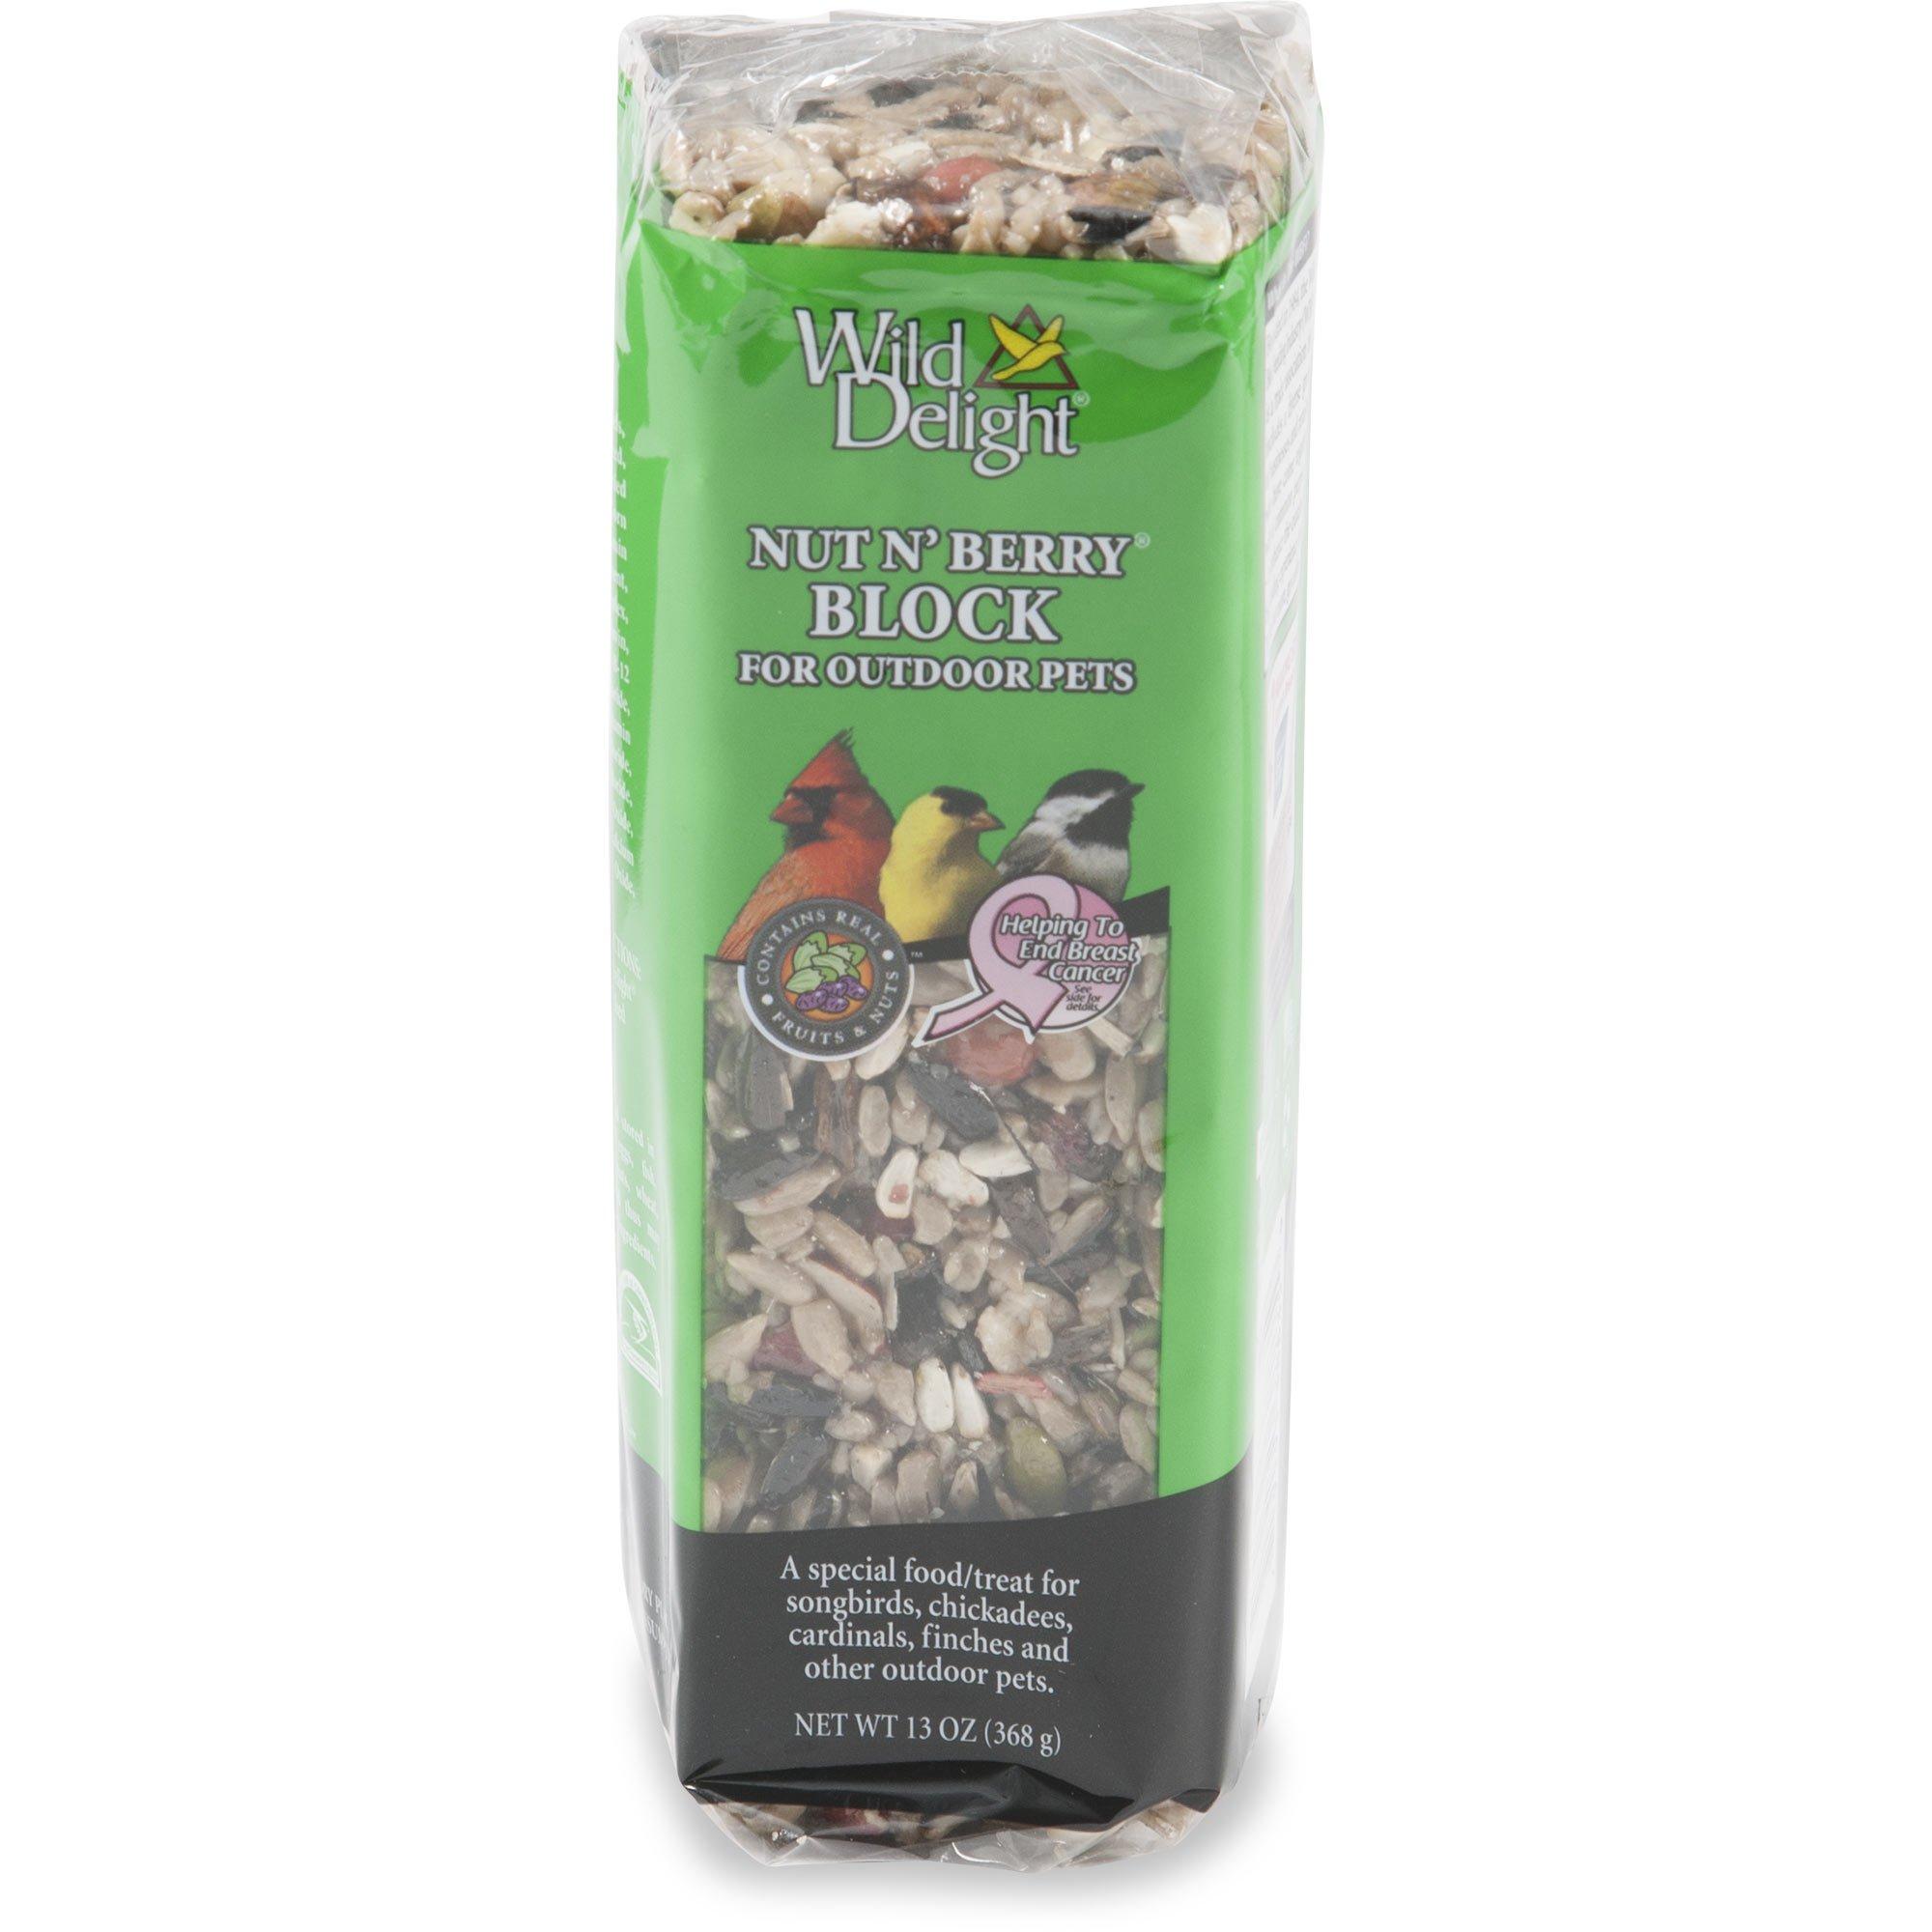 Wild Delight Nut N' Berry Food Block for Wild Birds, 13 oz  | Petco